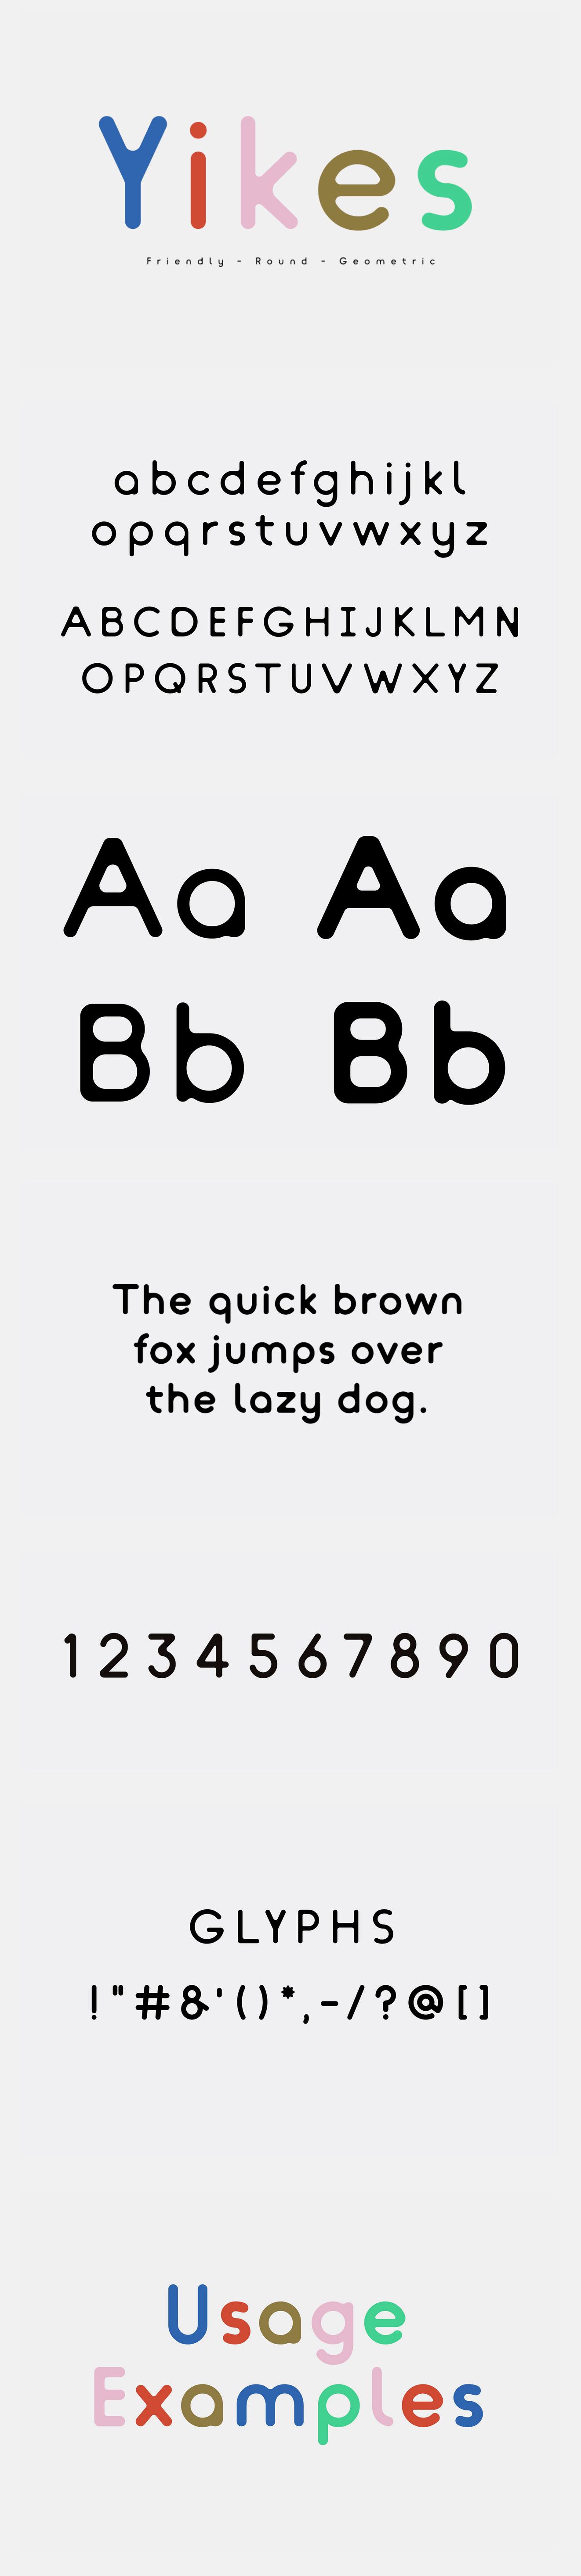 Yikes_ Typeface on Behance